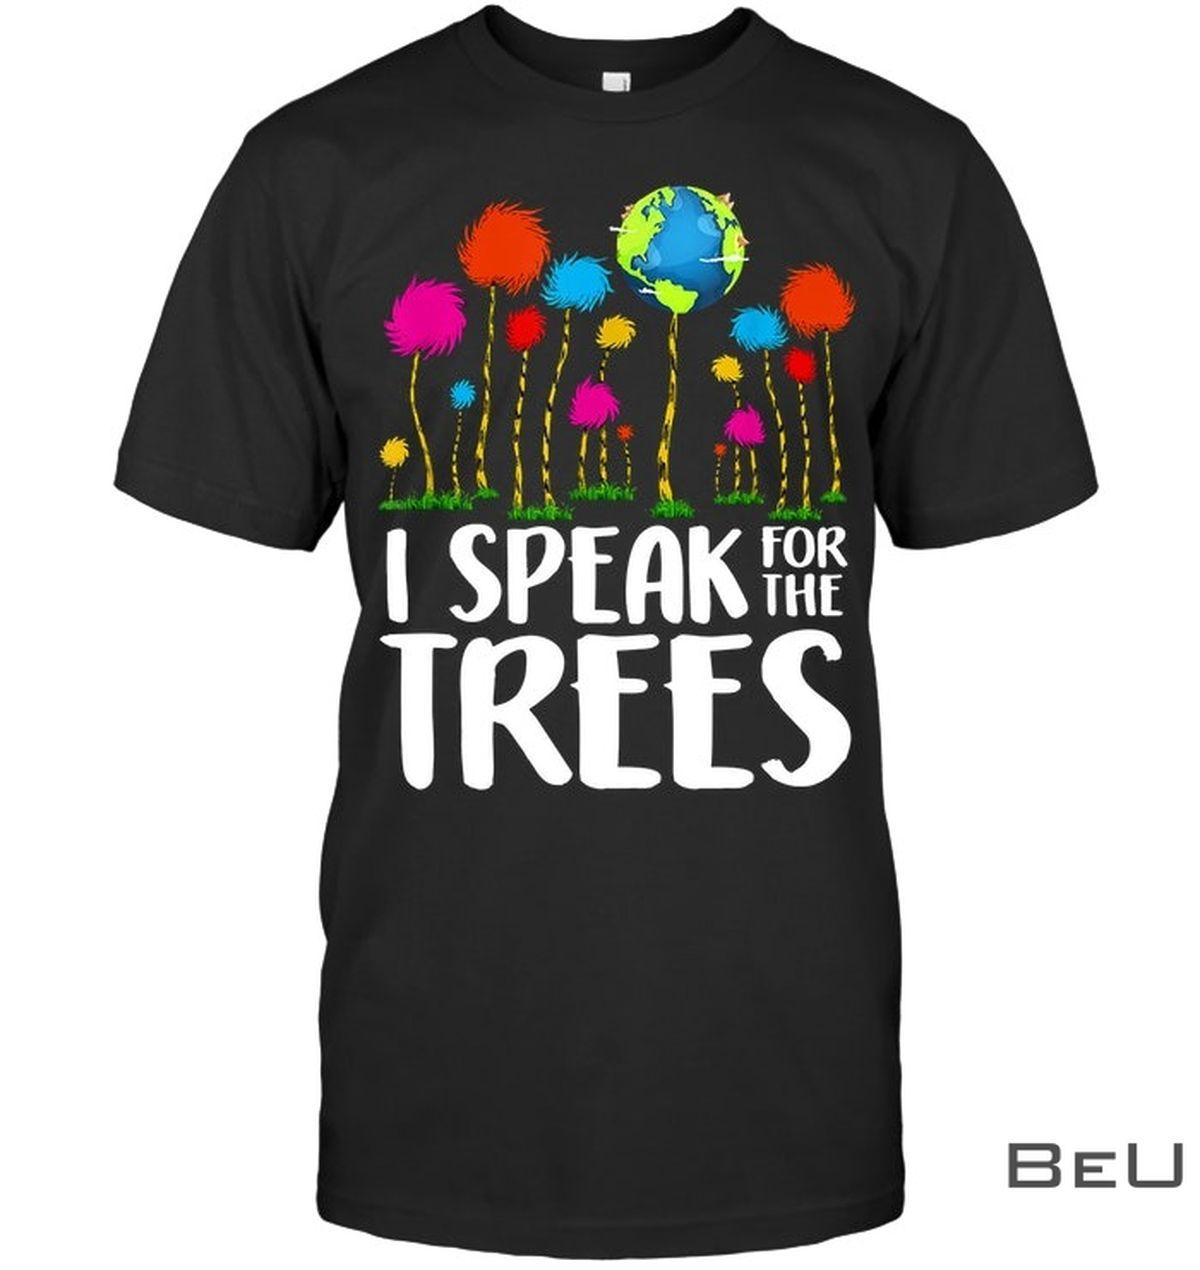 I Speak For Trees Earth Day Shirtc